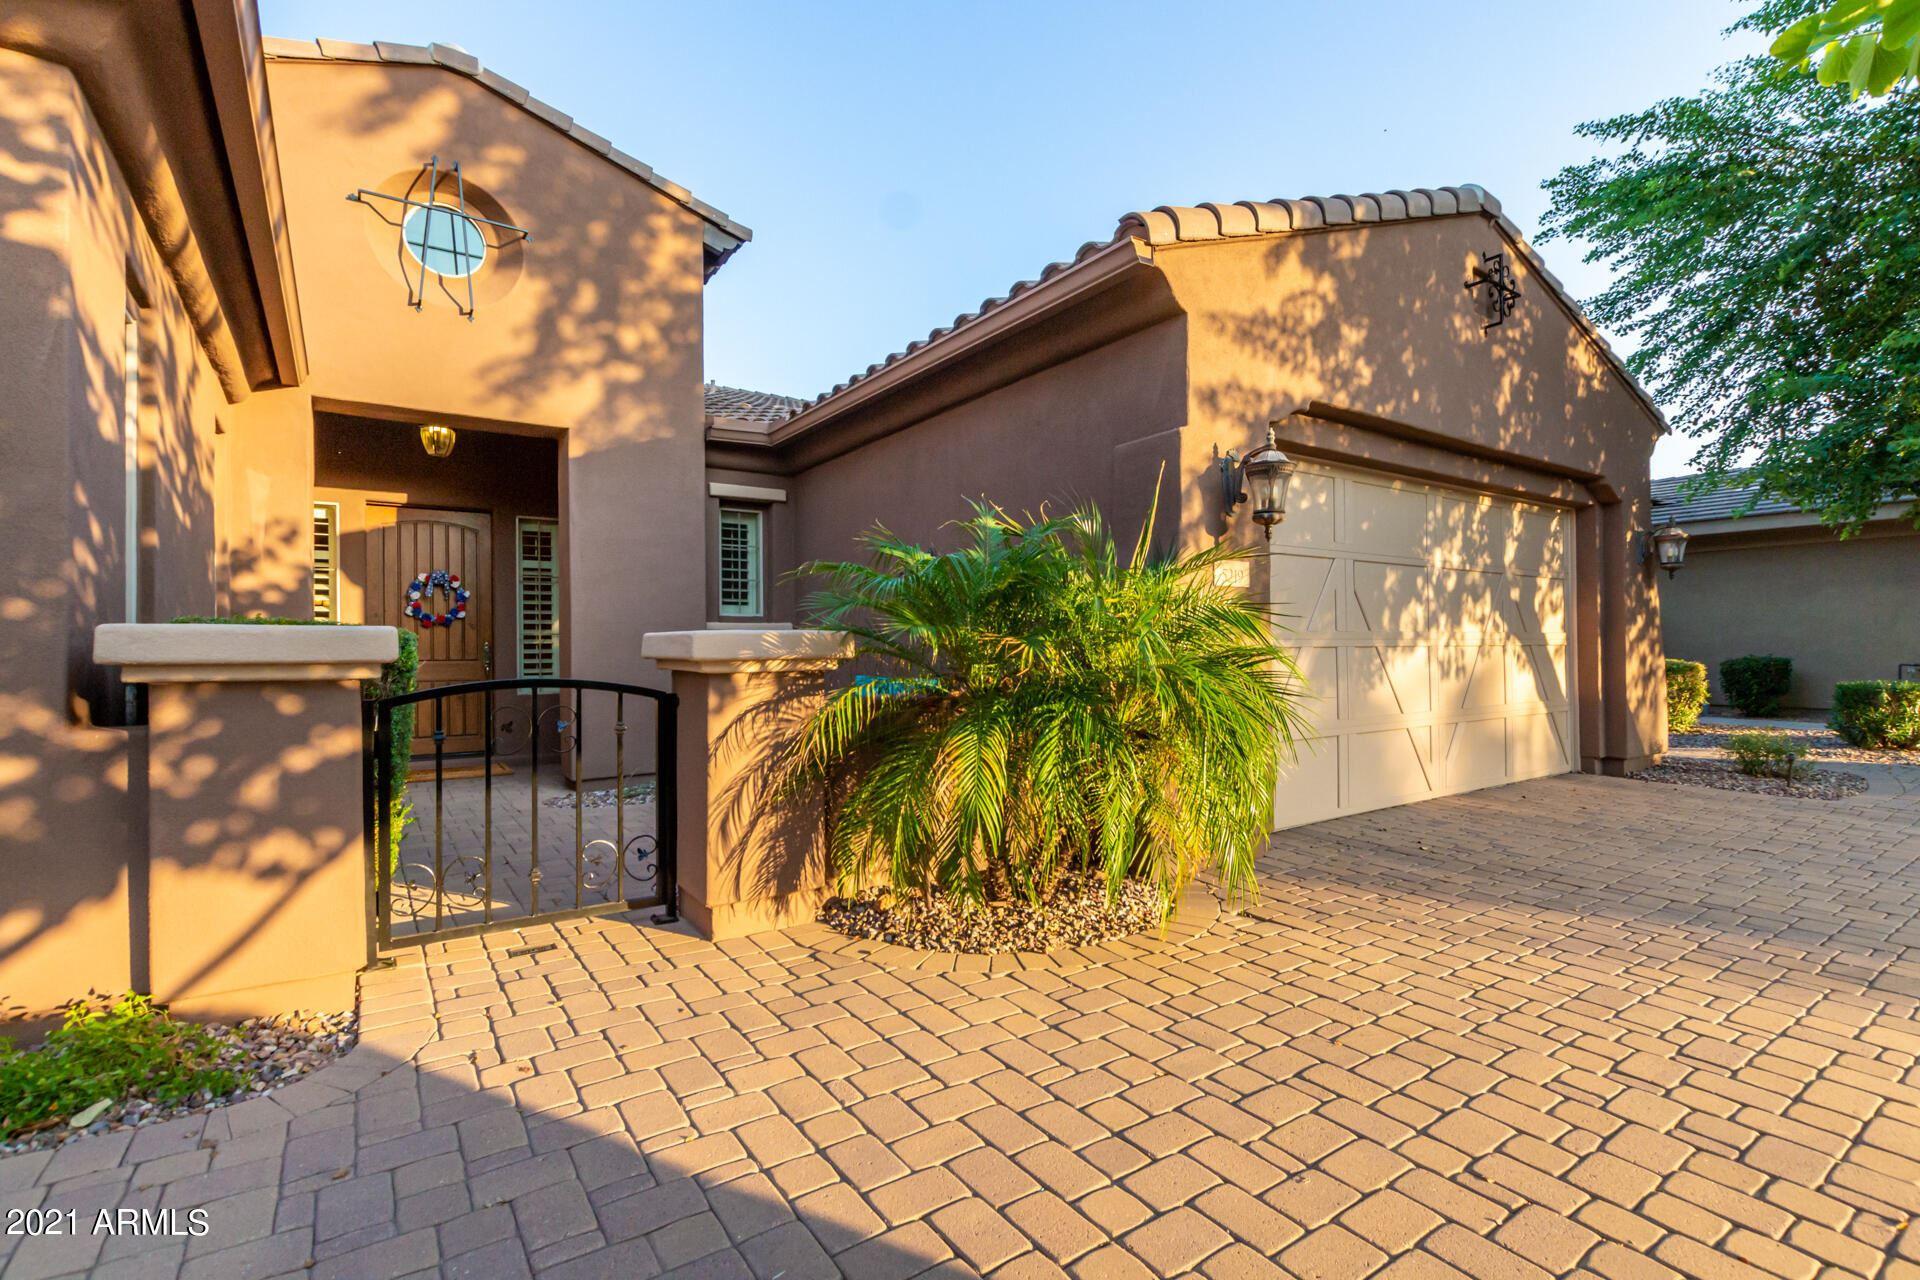 Photo of 5219 S LUKE Drive S, Chandler, AZ 85249 (MLS # 6299698)